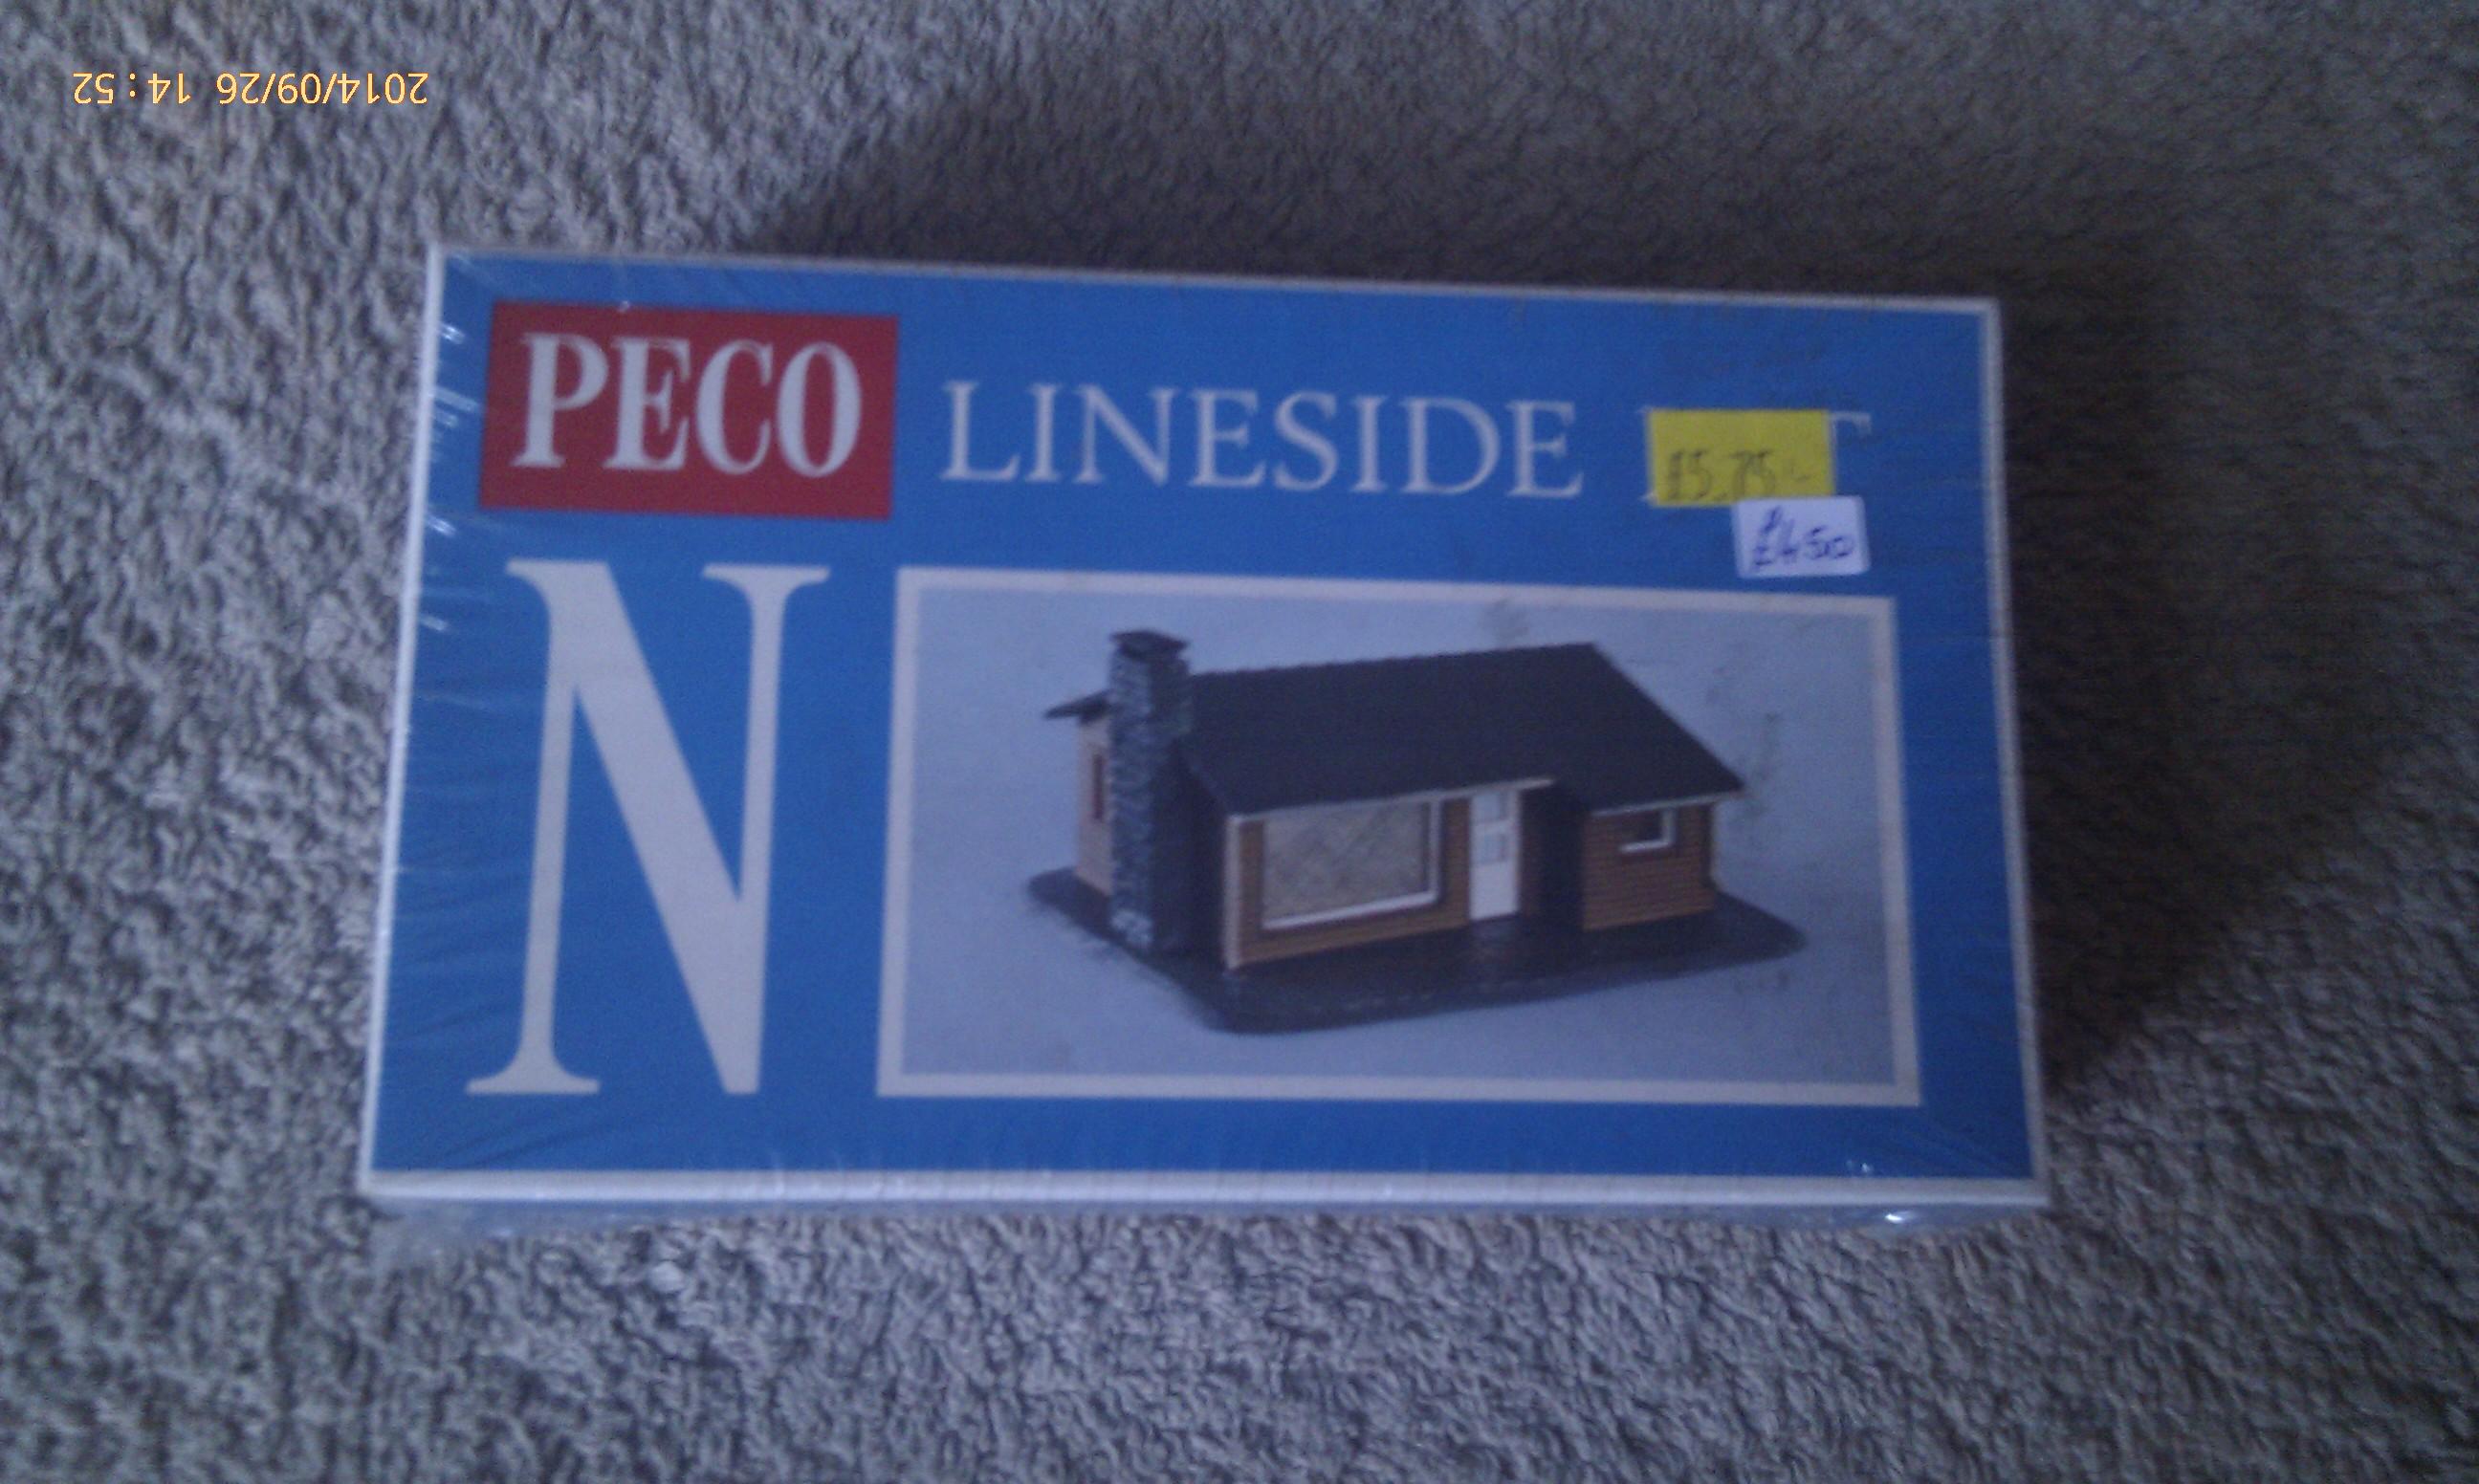 Peco Lineside Kit - Small Cedarwood Bungalow NB-9